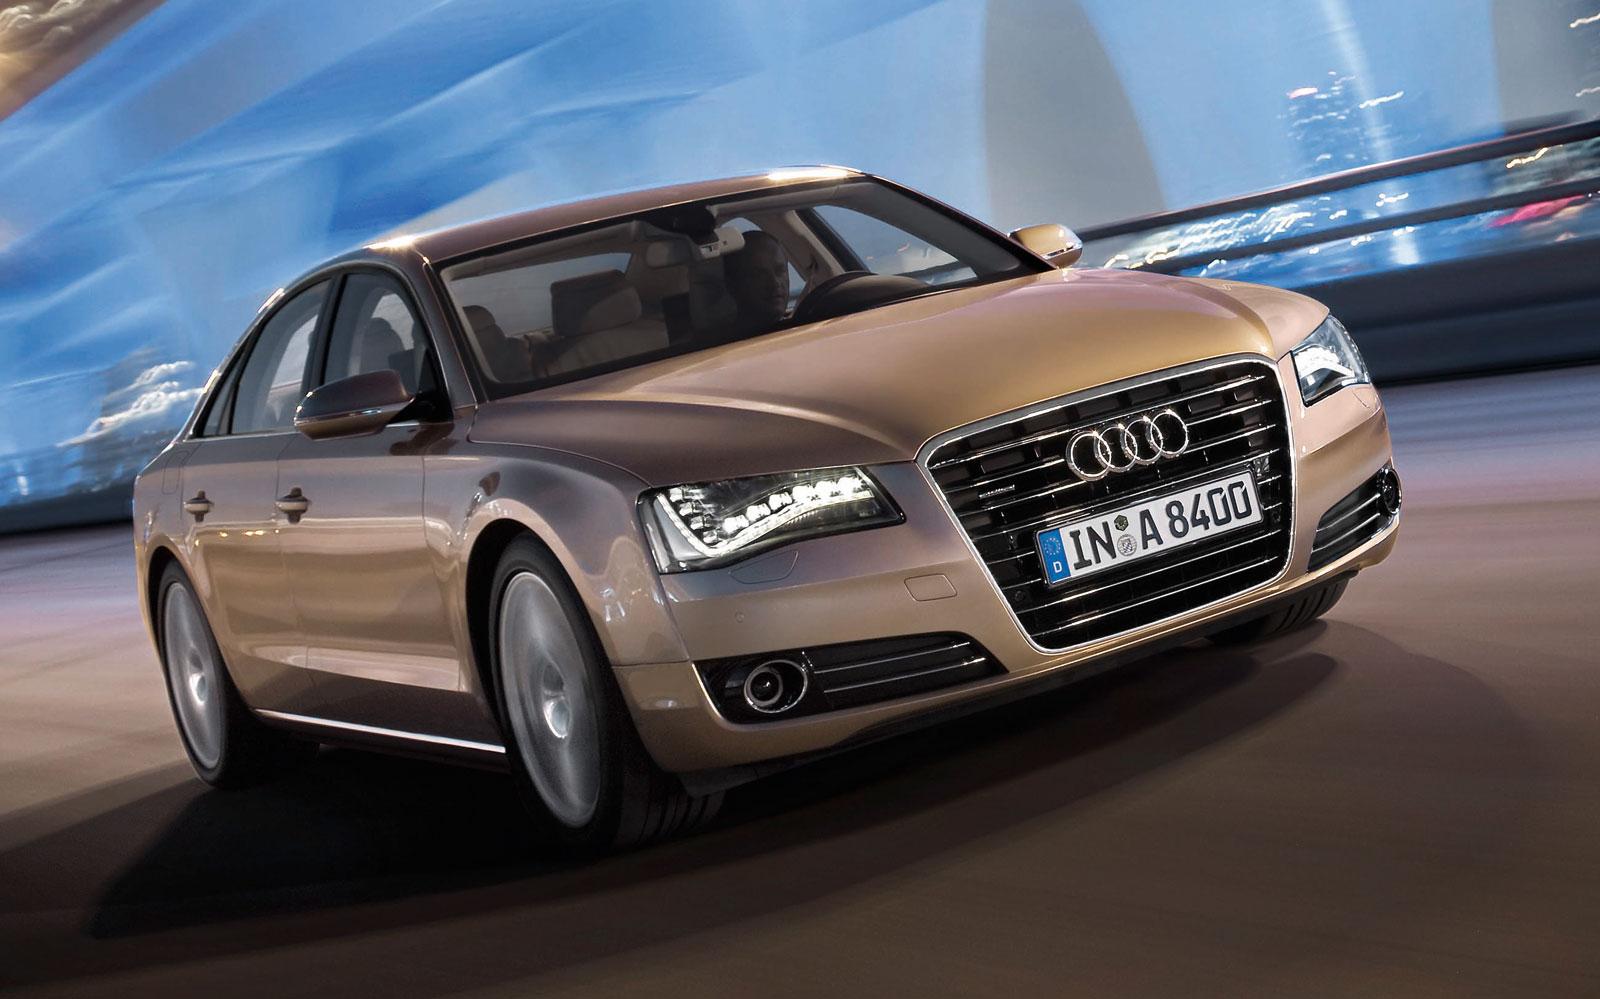 http://4.bp.blogspot.com/-bryi3AOd894/T-Ce4CHl_KI/AAAAAAAADnk/pU-5qLdAnJ0/s1600/Audi+A8+hd+Wallpapers+2011_1.jpg